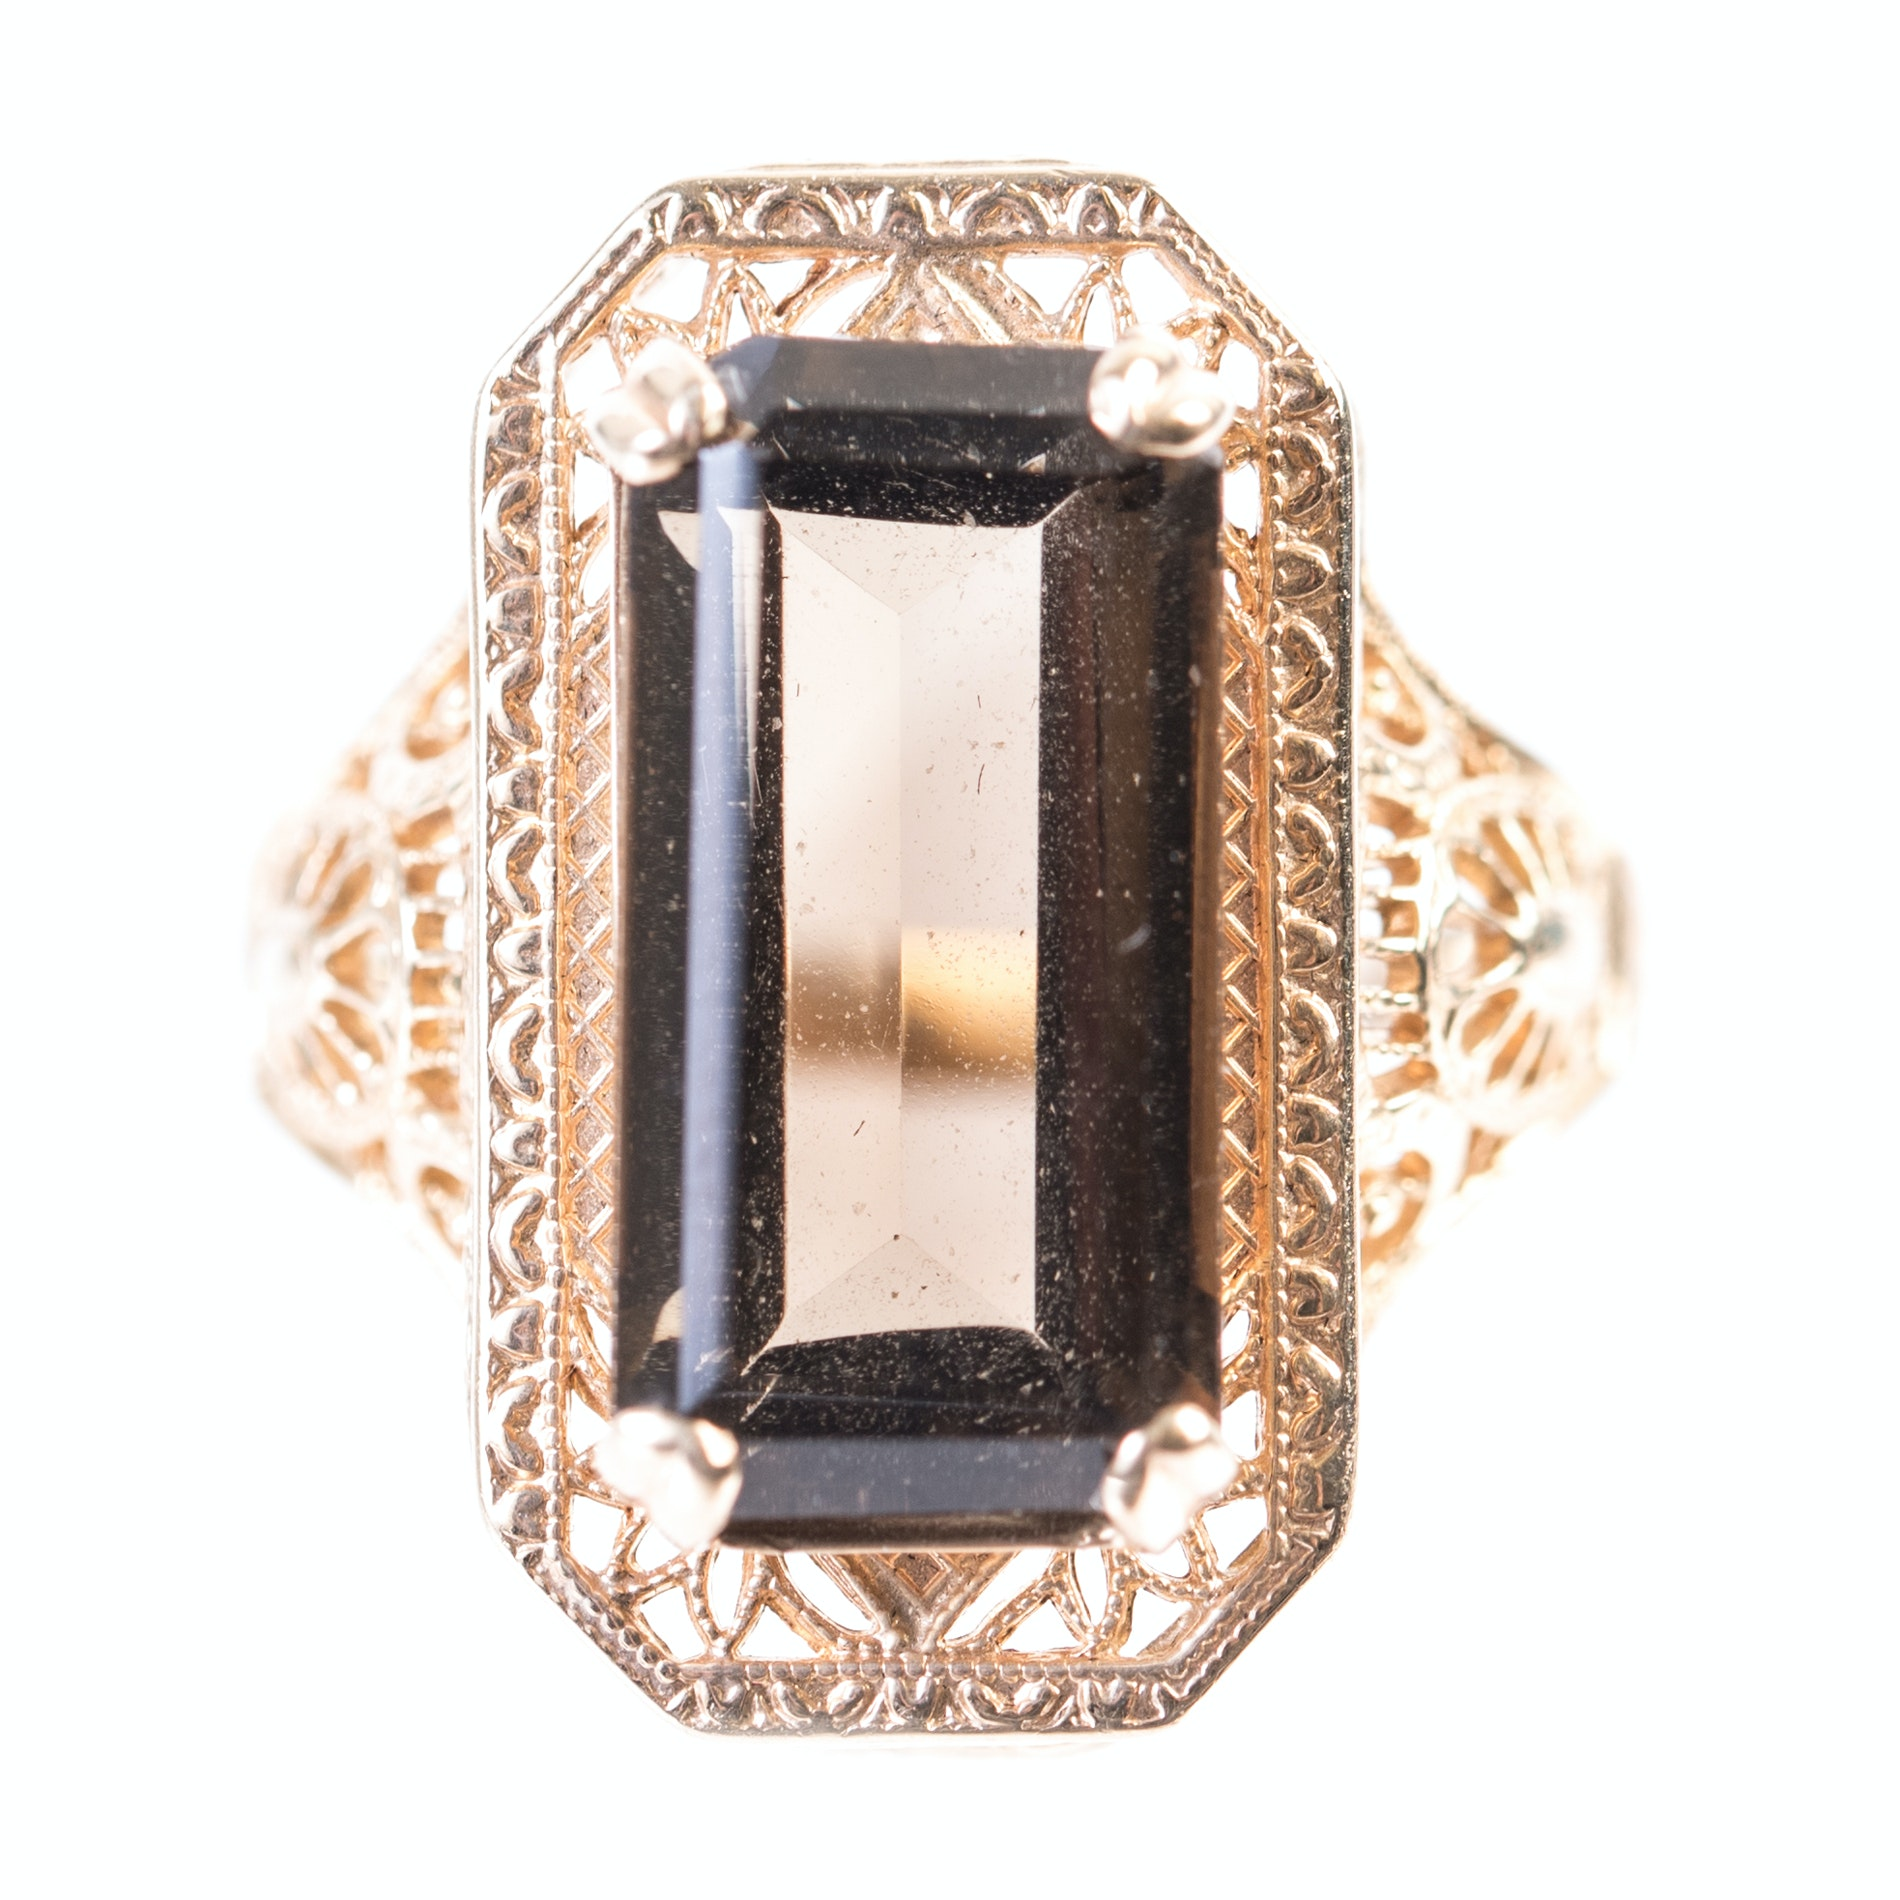 10K Yellow Gold and 5.26 Carat Smoky Quartz Filigree Ring